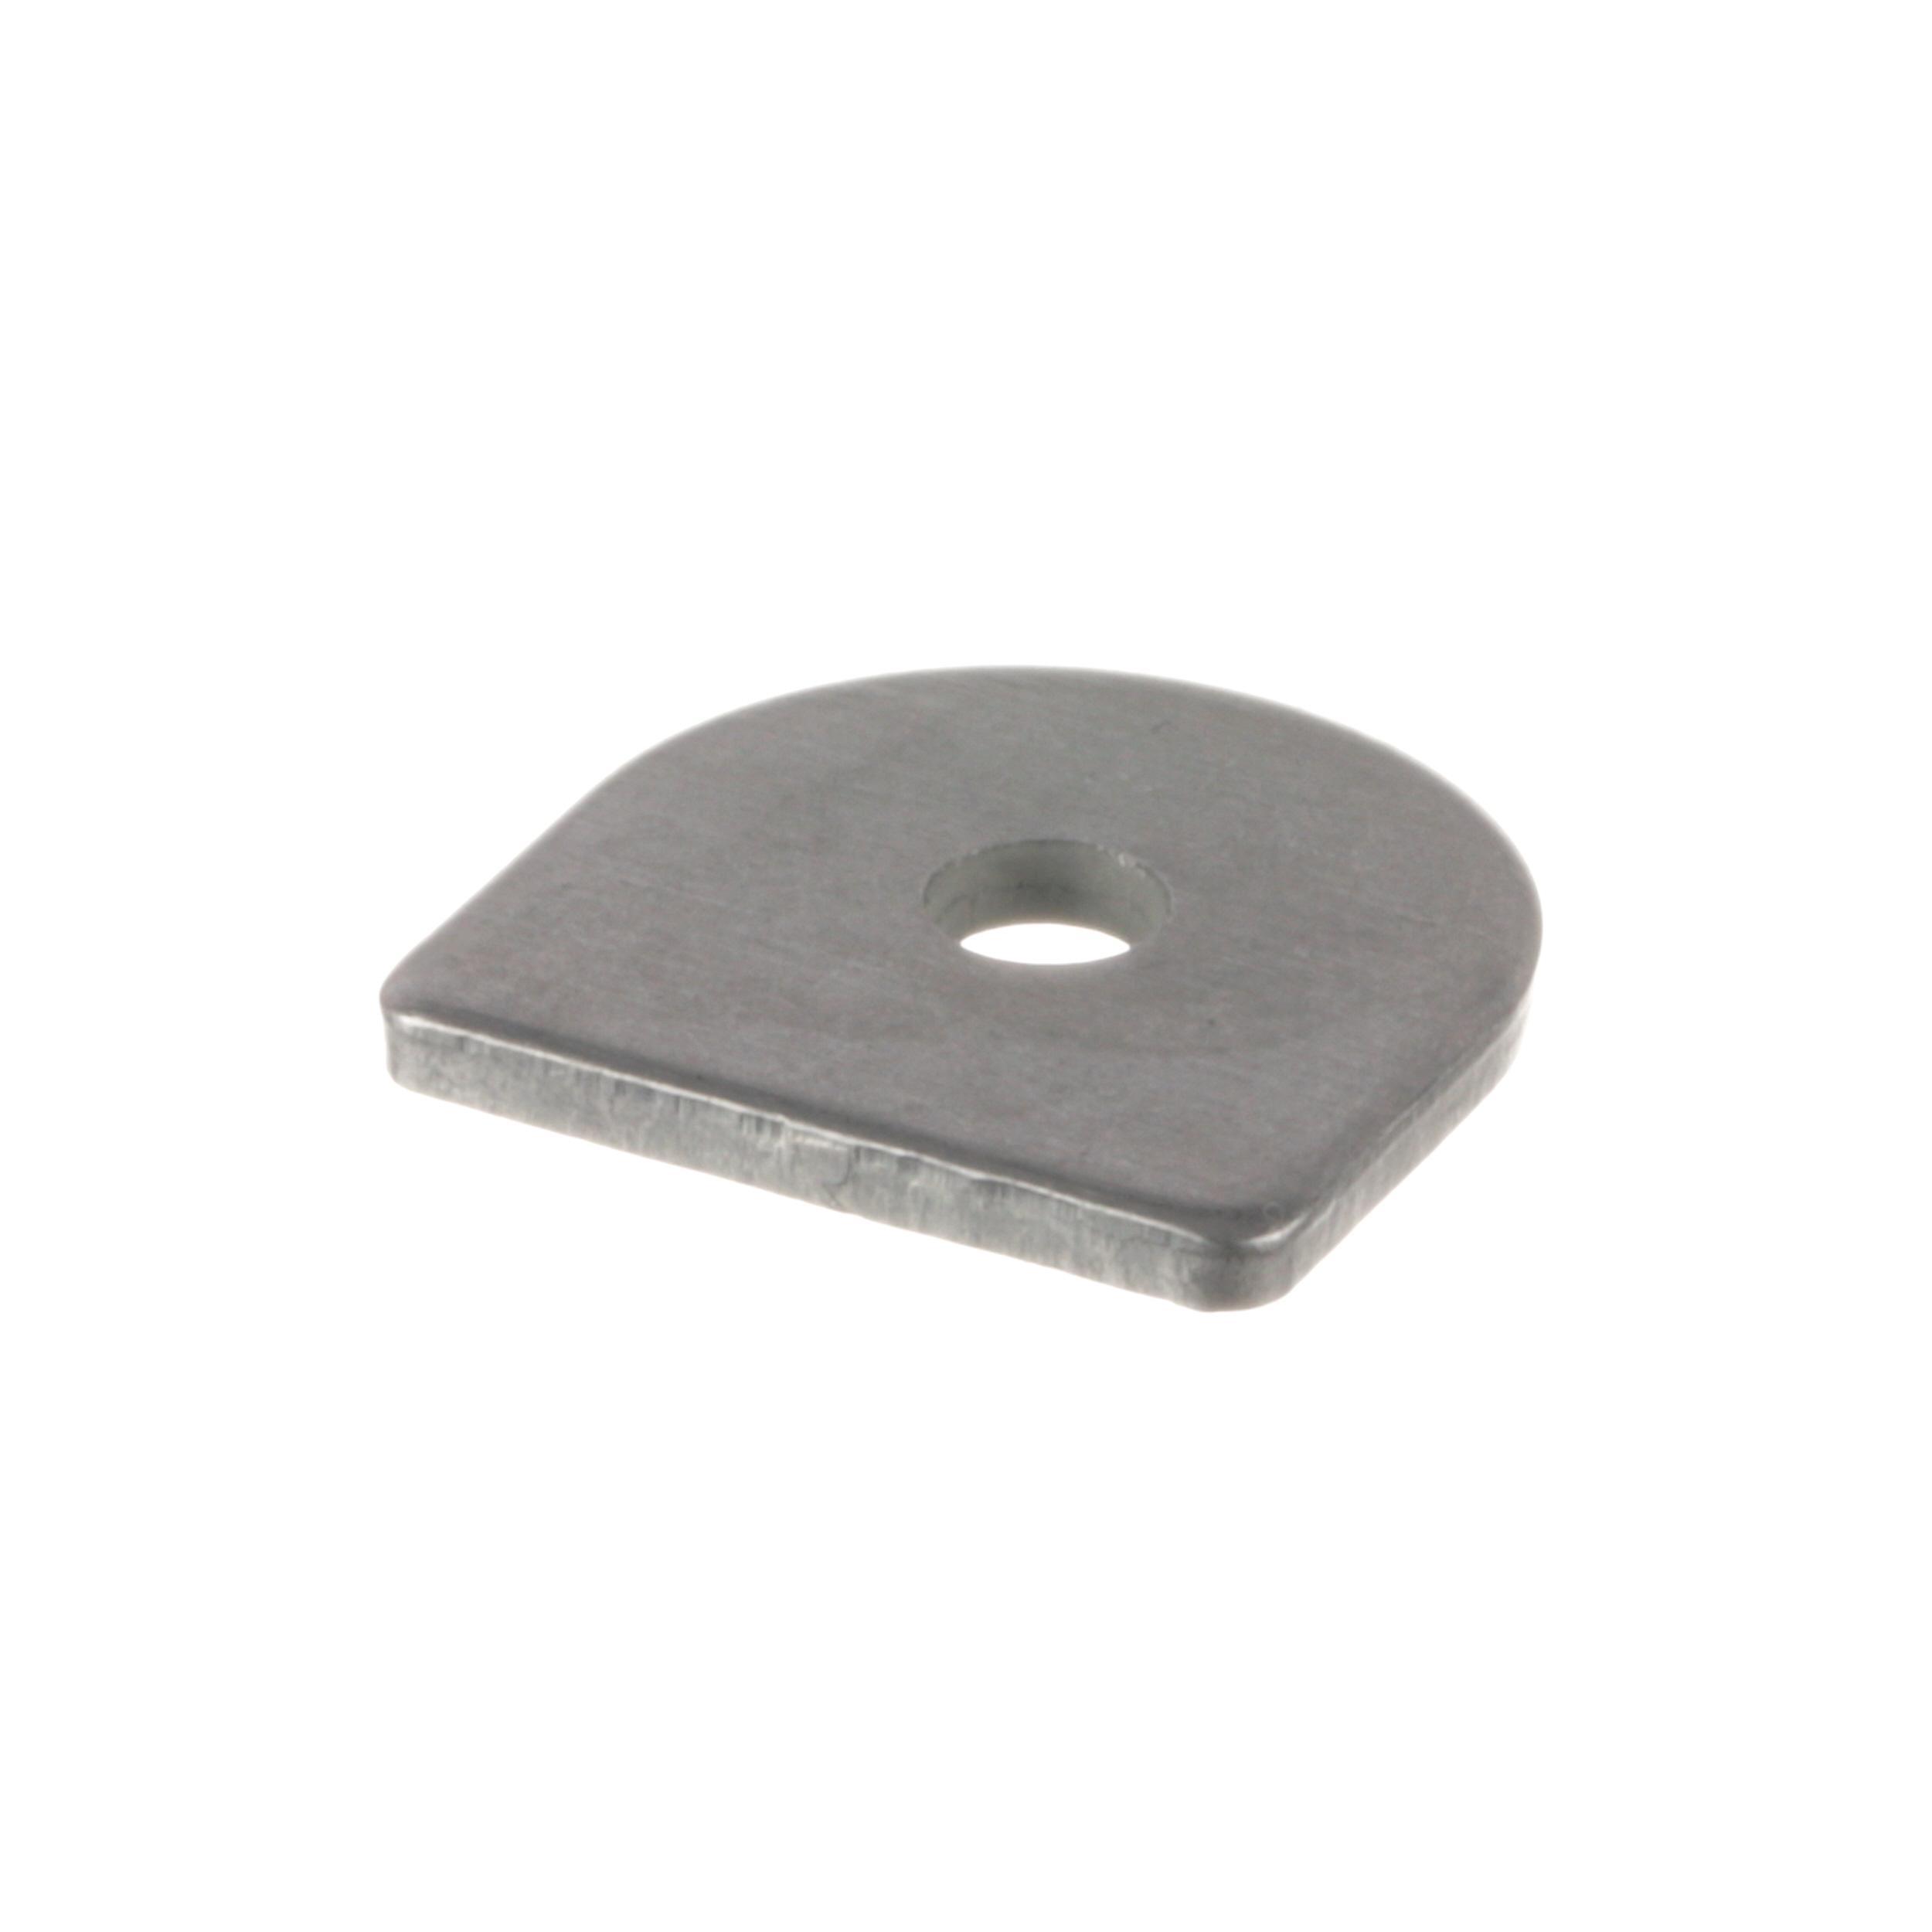 DUKE CAP HINGE PIN 48X1.312 12GA SST=39 PCS